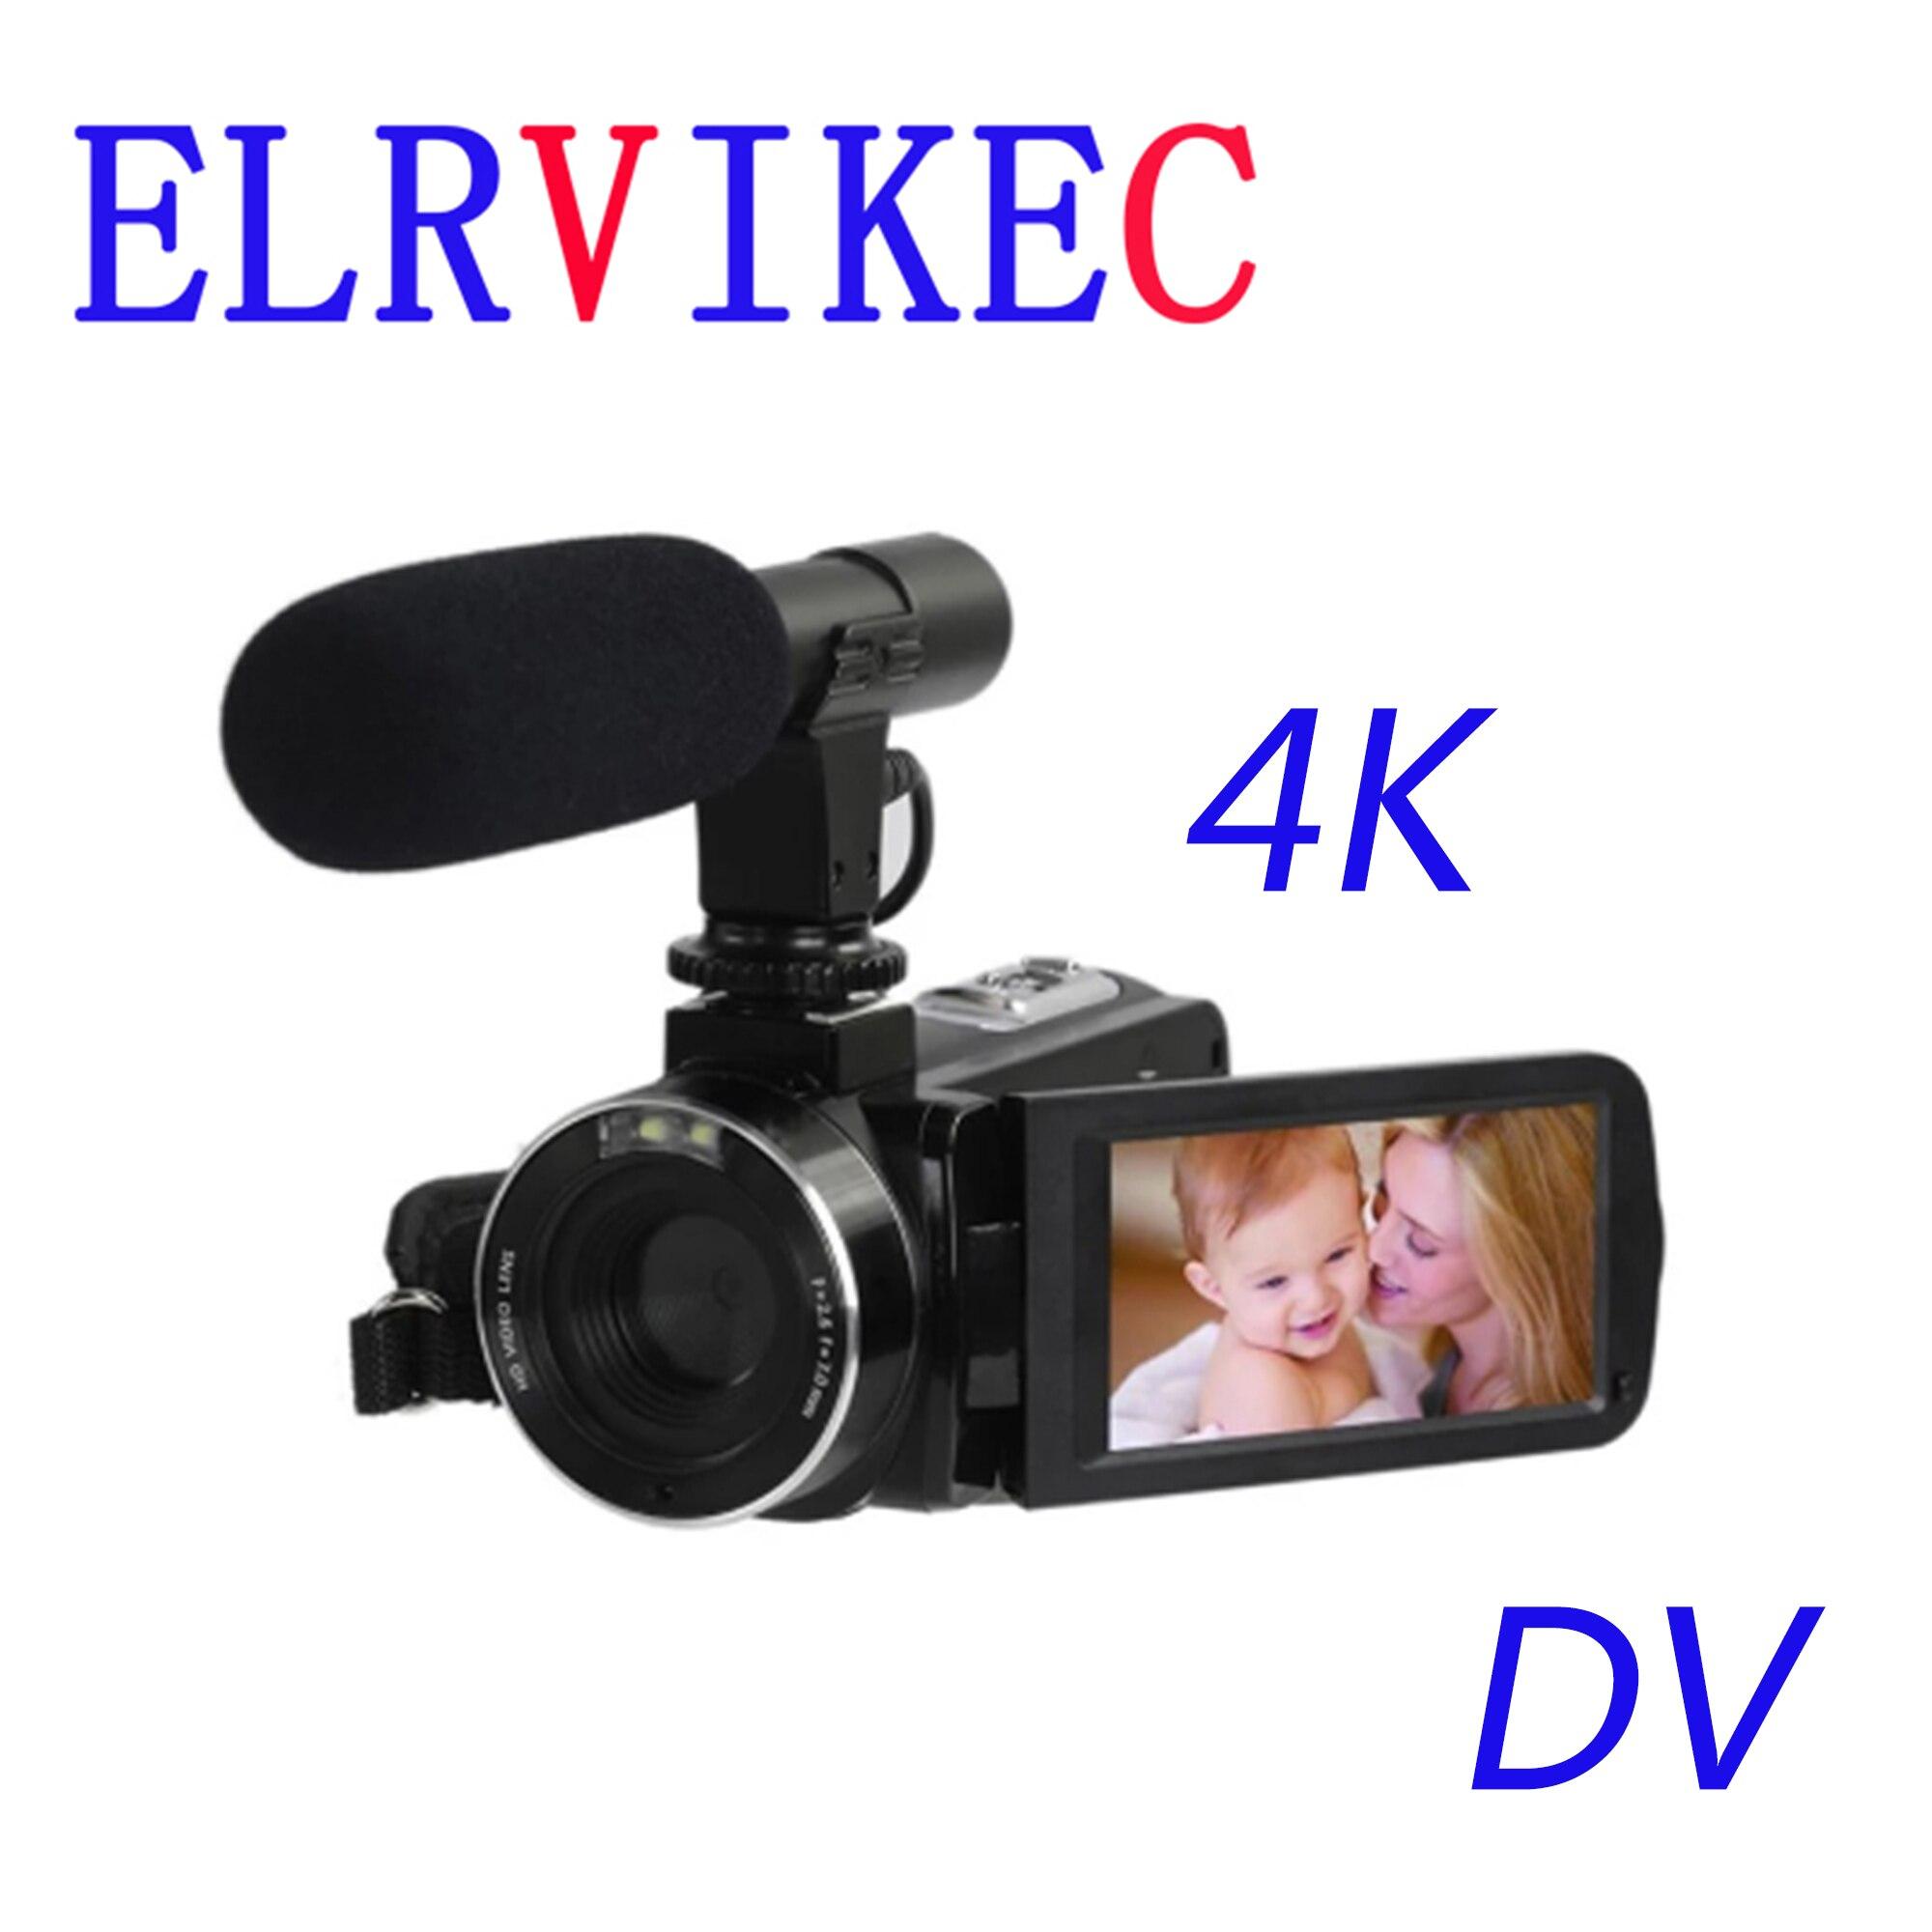 ELRVIKEC 4K 48 ميجابيكسل الرياضة FHD-DV4K جديد المهنية كاميرا رقمية عالية الوضوح تعمل باللمس الرياضة DV كاميرا مع سماعة